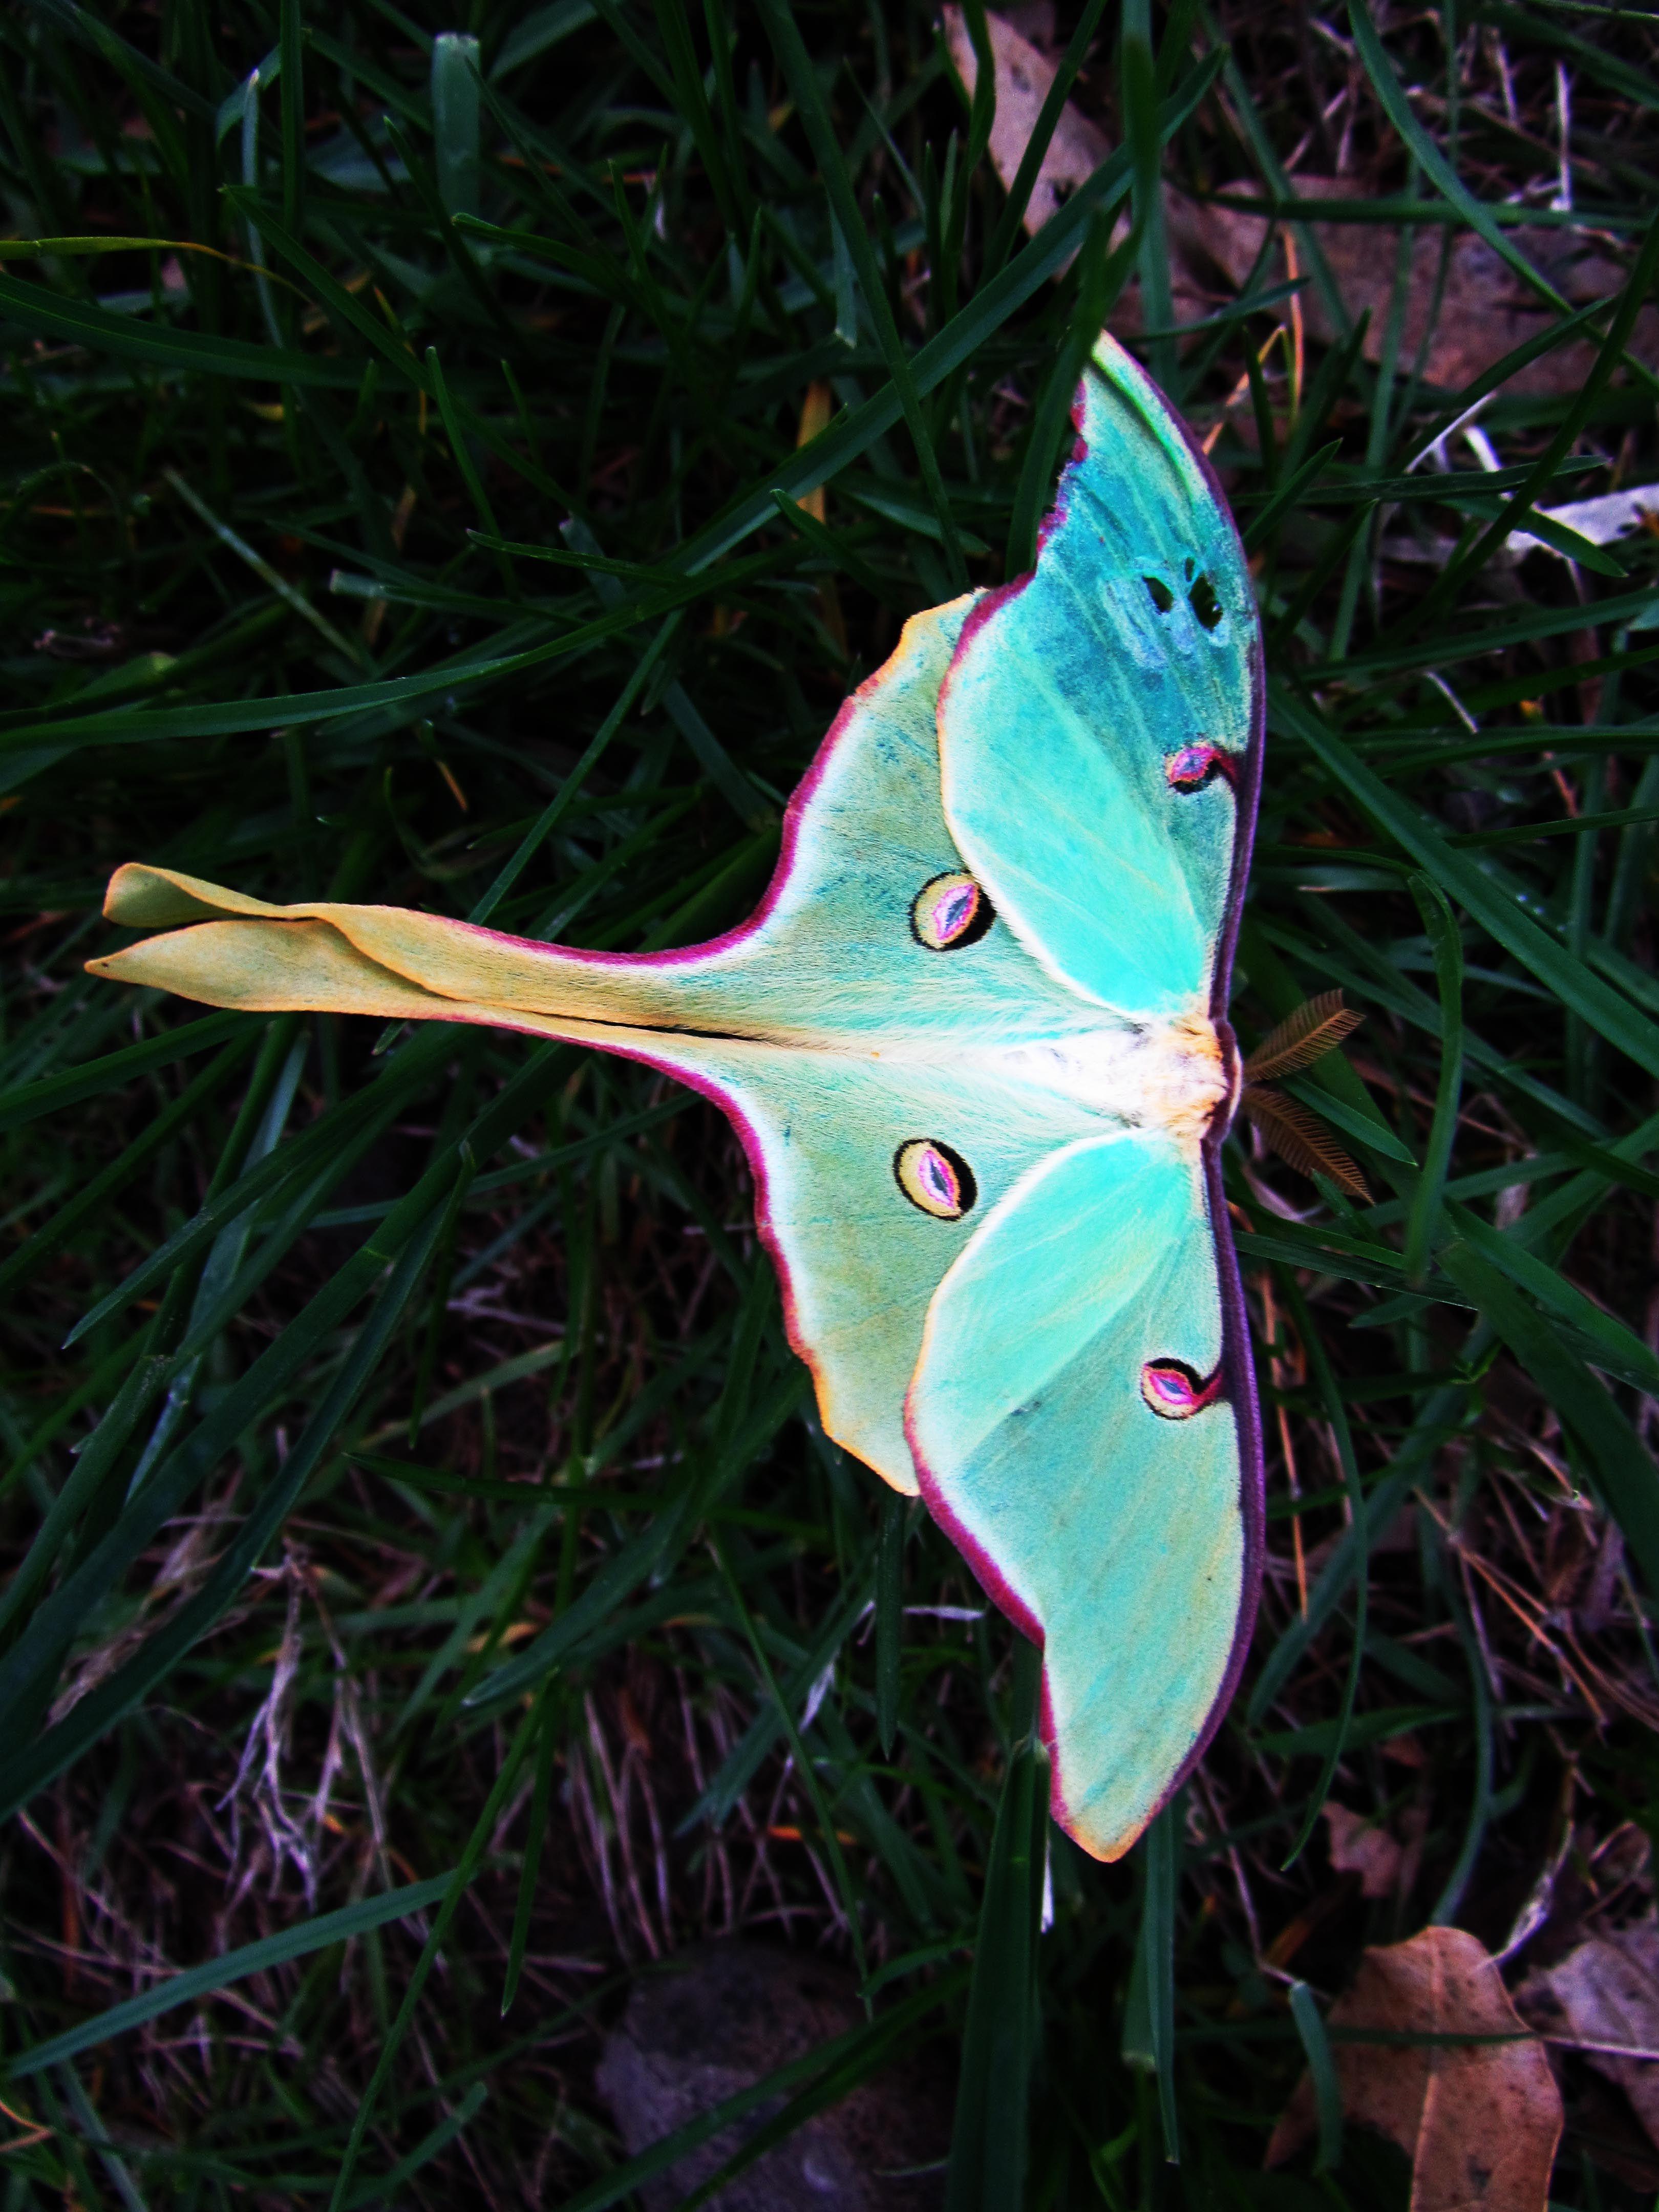 Pin By Ariana Tull On Things I Love 3 Luna Moth Tattoo Moth Tattoo Luna Moth